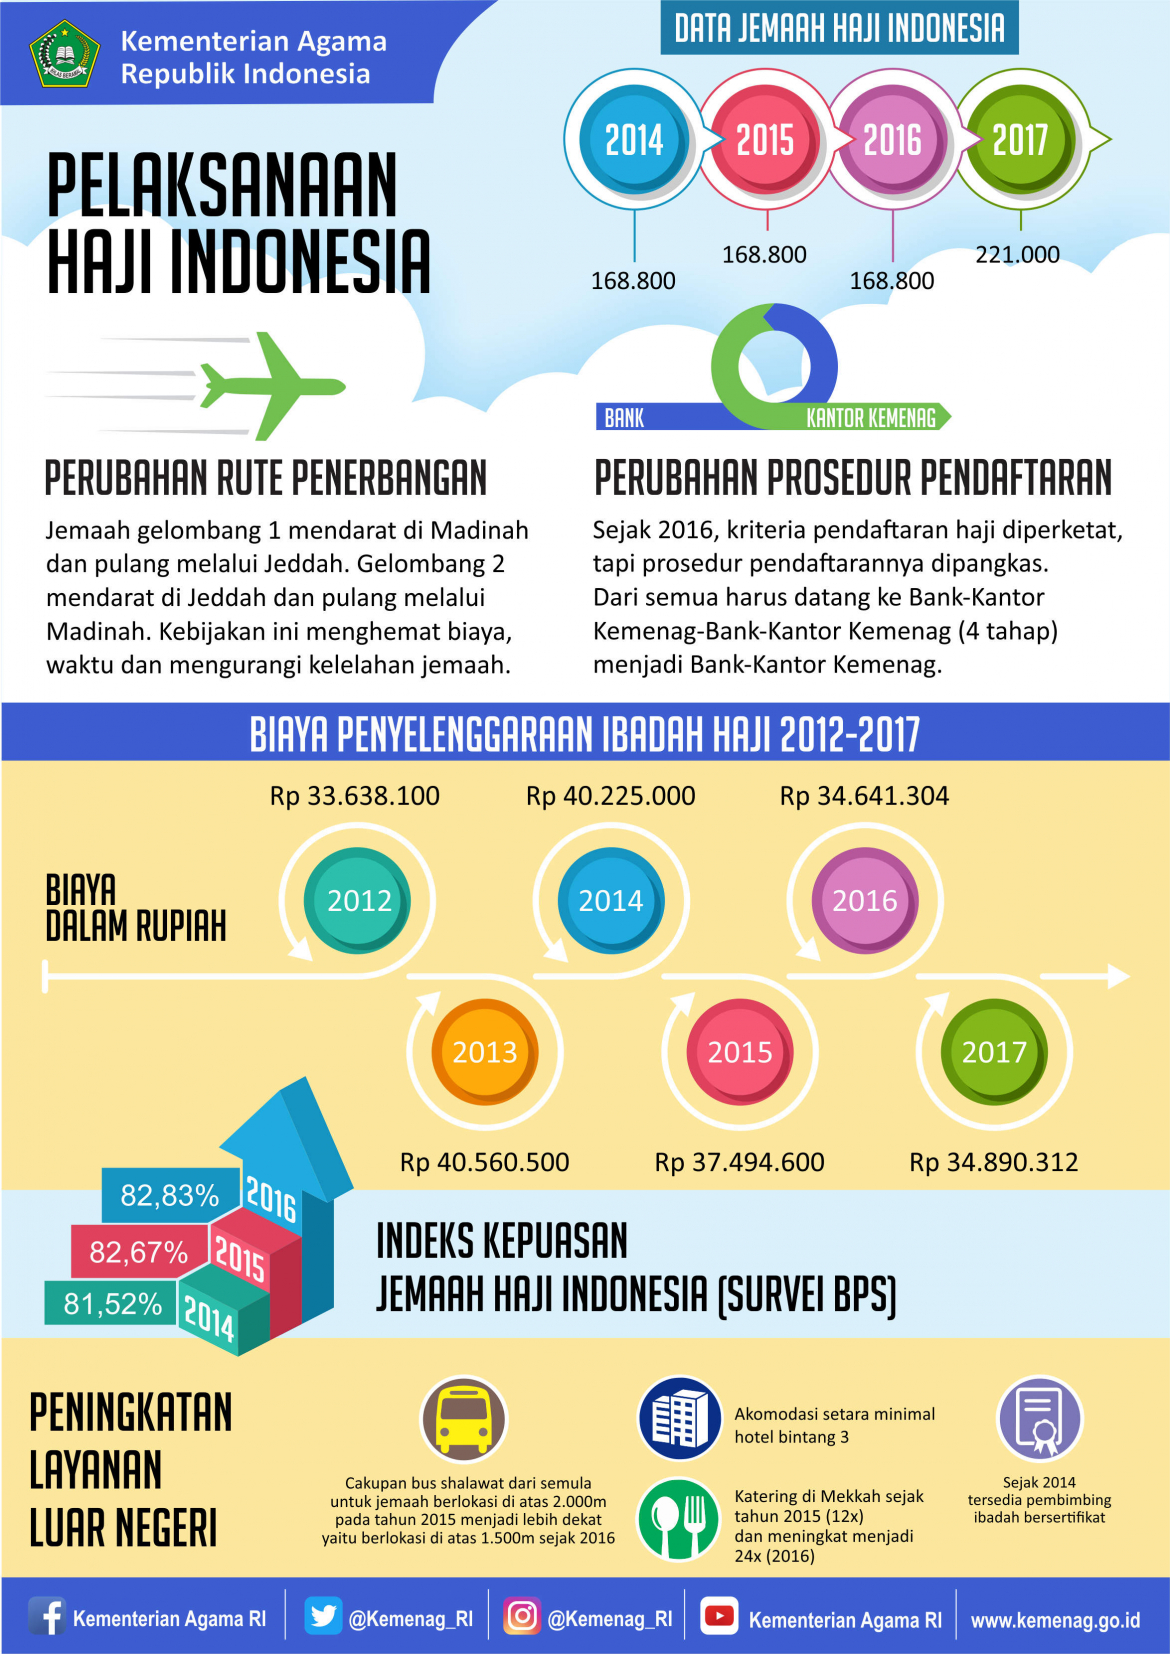 Info Grafis Pelaksanaan Ibadah Haji Indonesia 2018 dari Kemenag